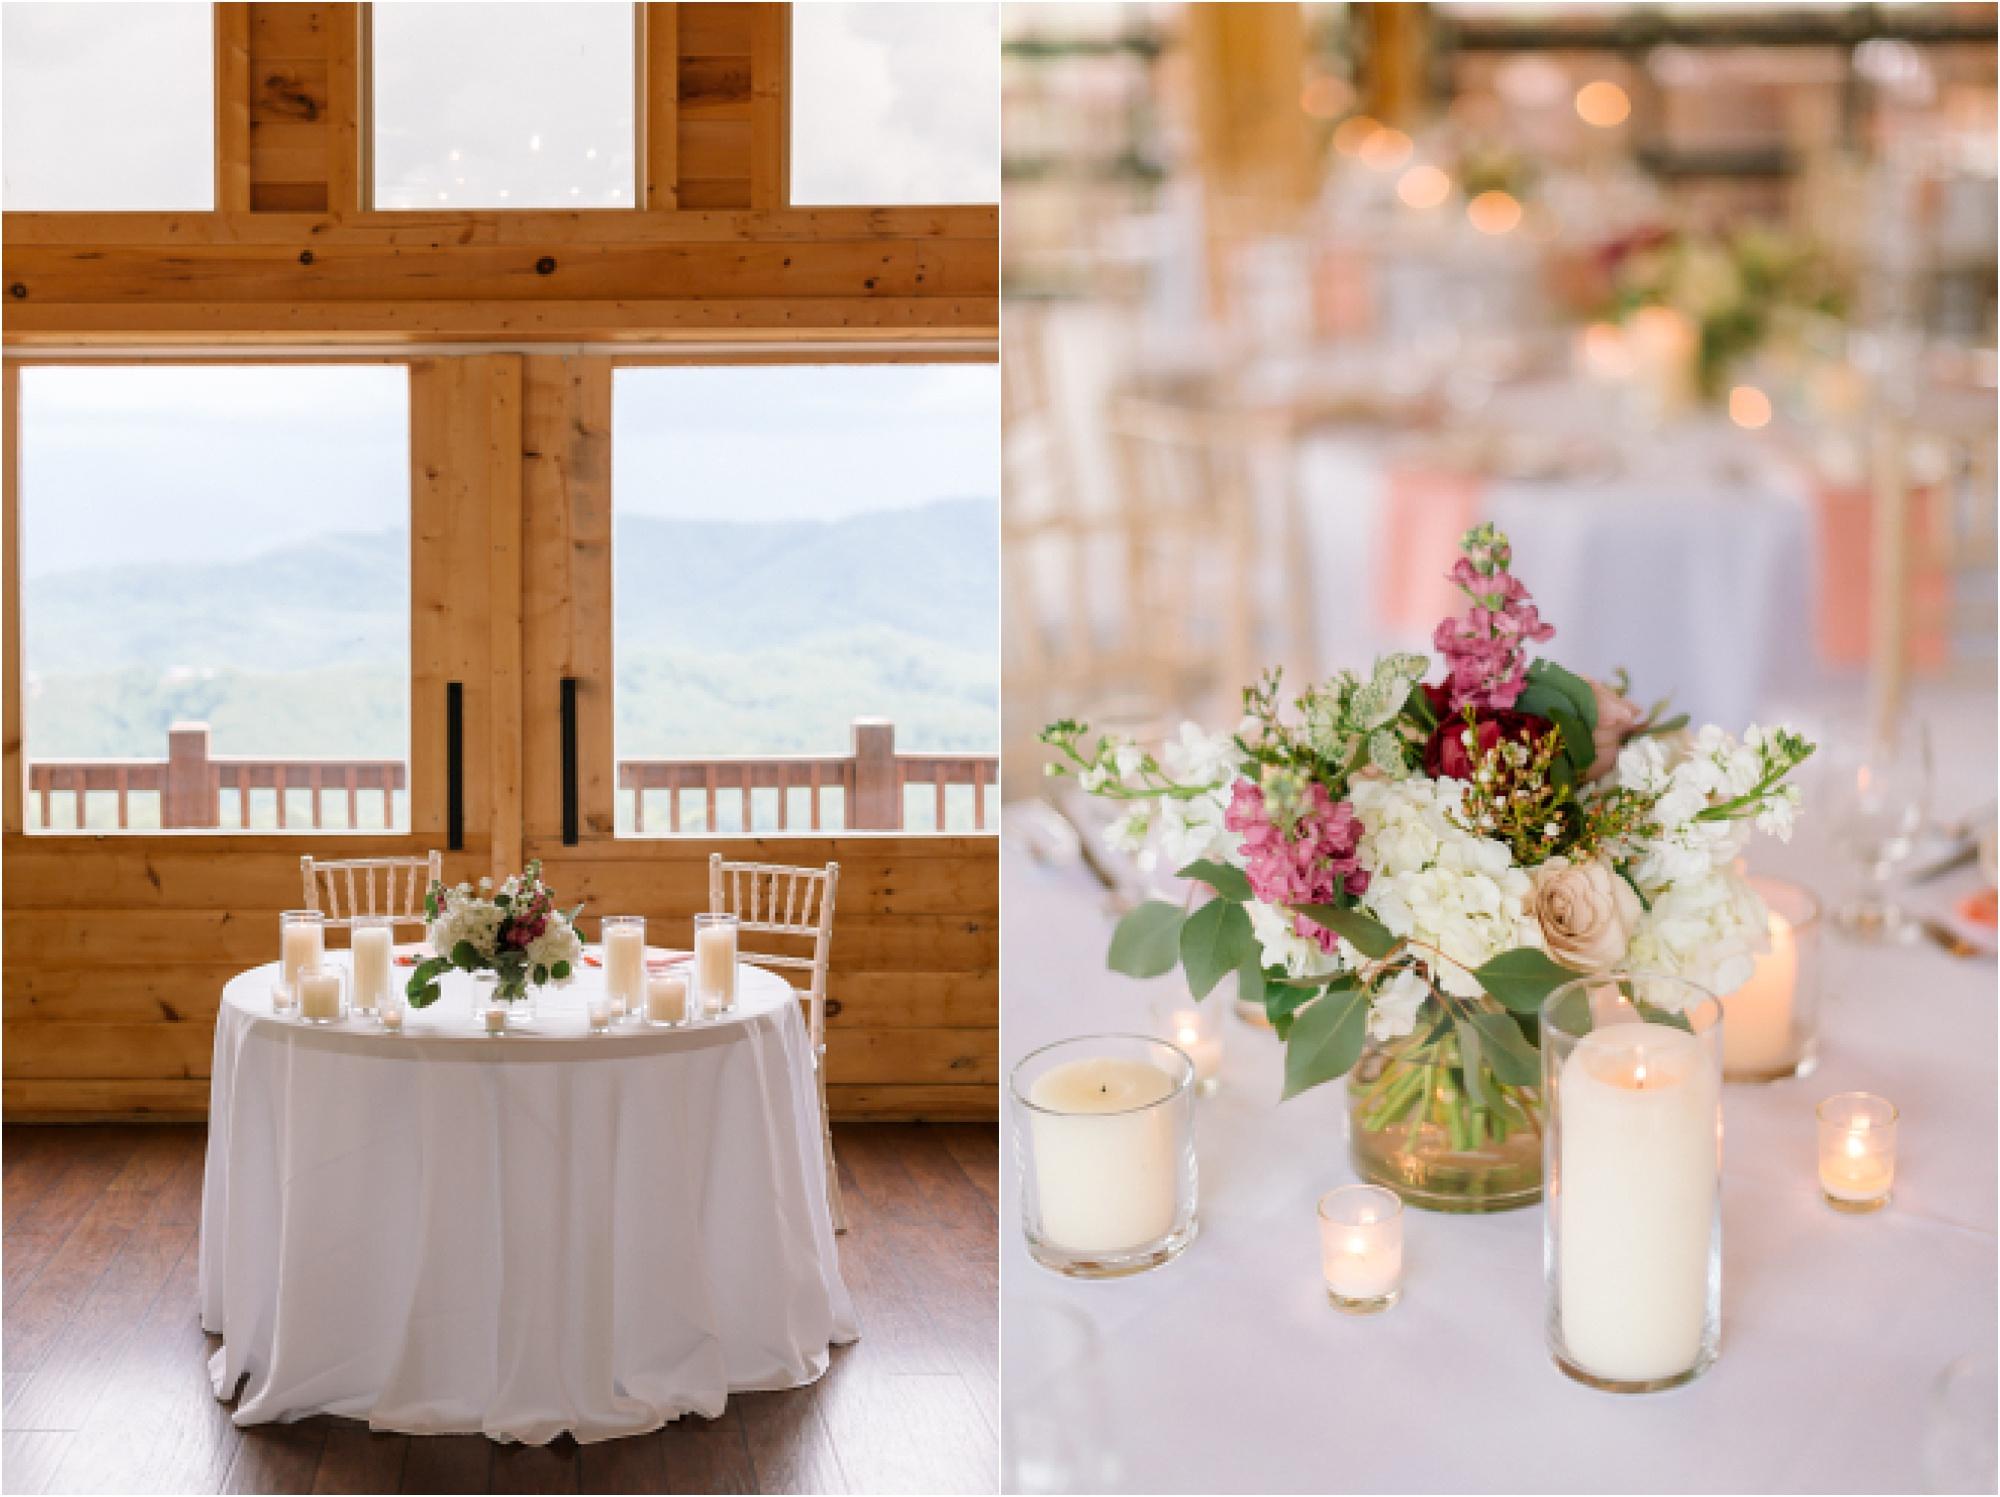 blush pink wedding decor at reception